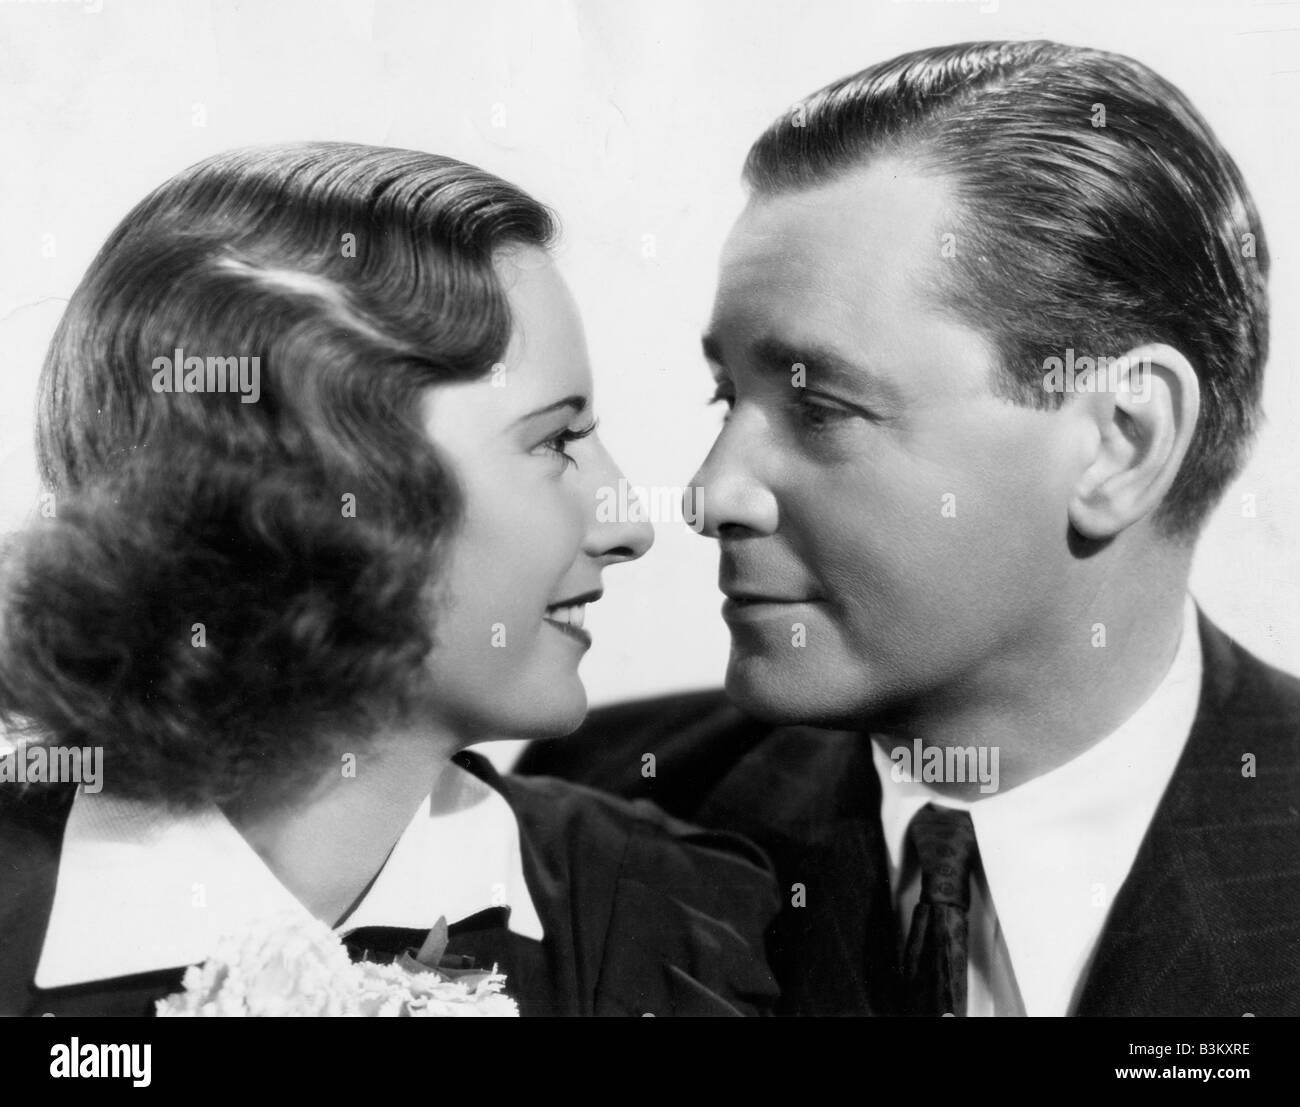 ALWAYS GOODBYE 1938 TCF film with Barbara Stanwyck and Herbert Marshall - Stock Image